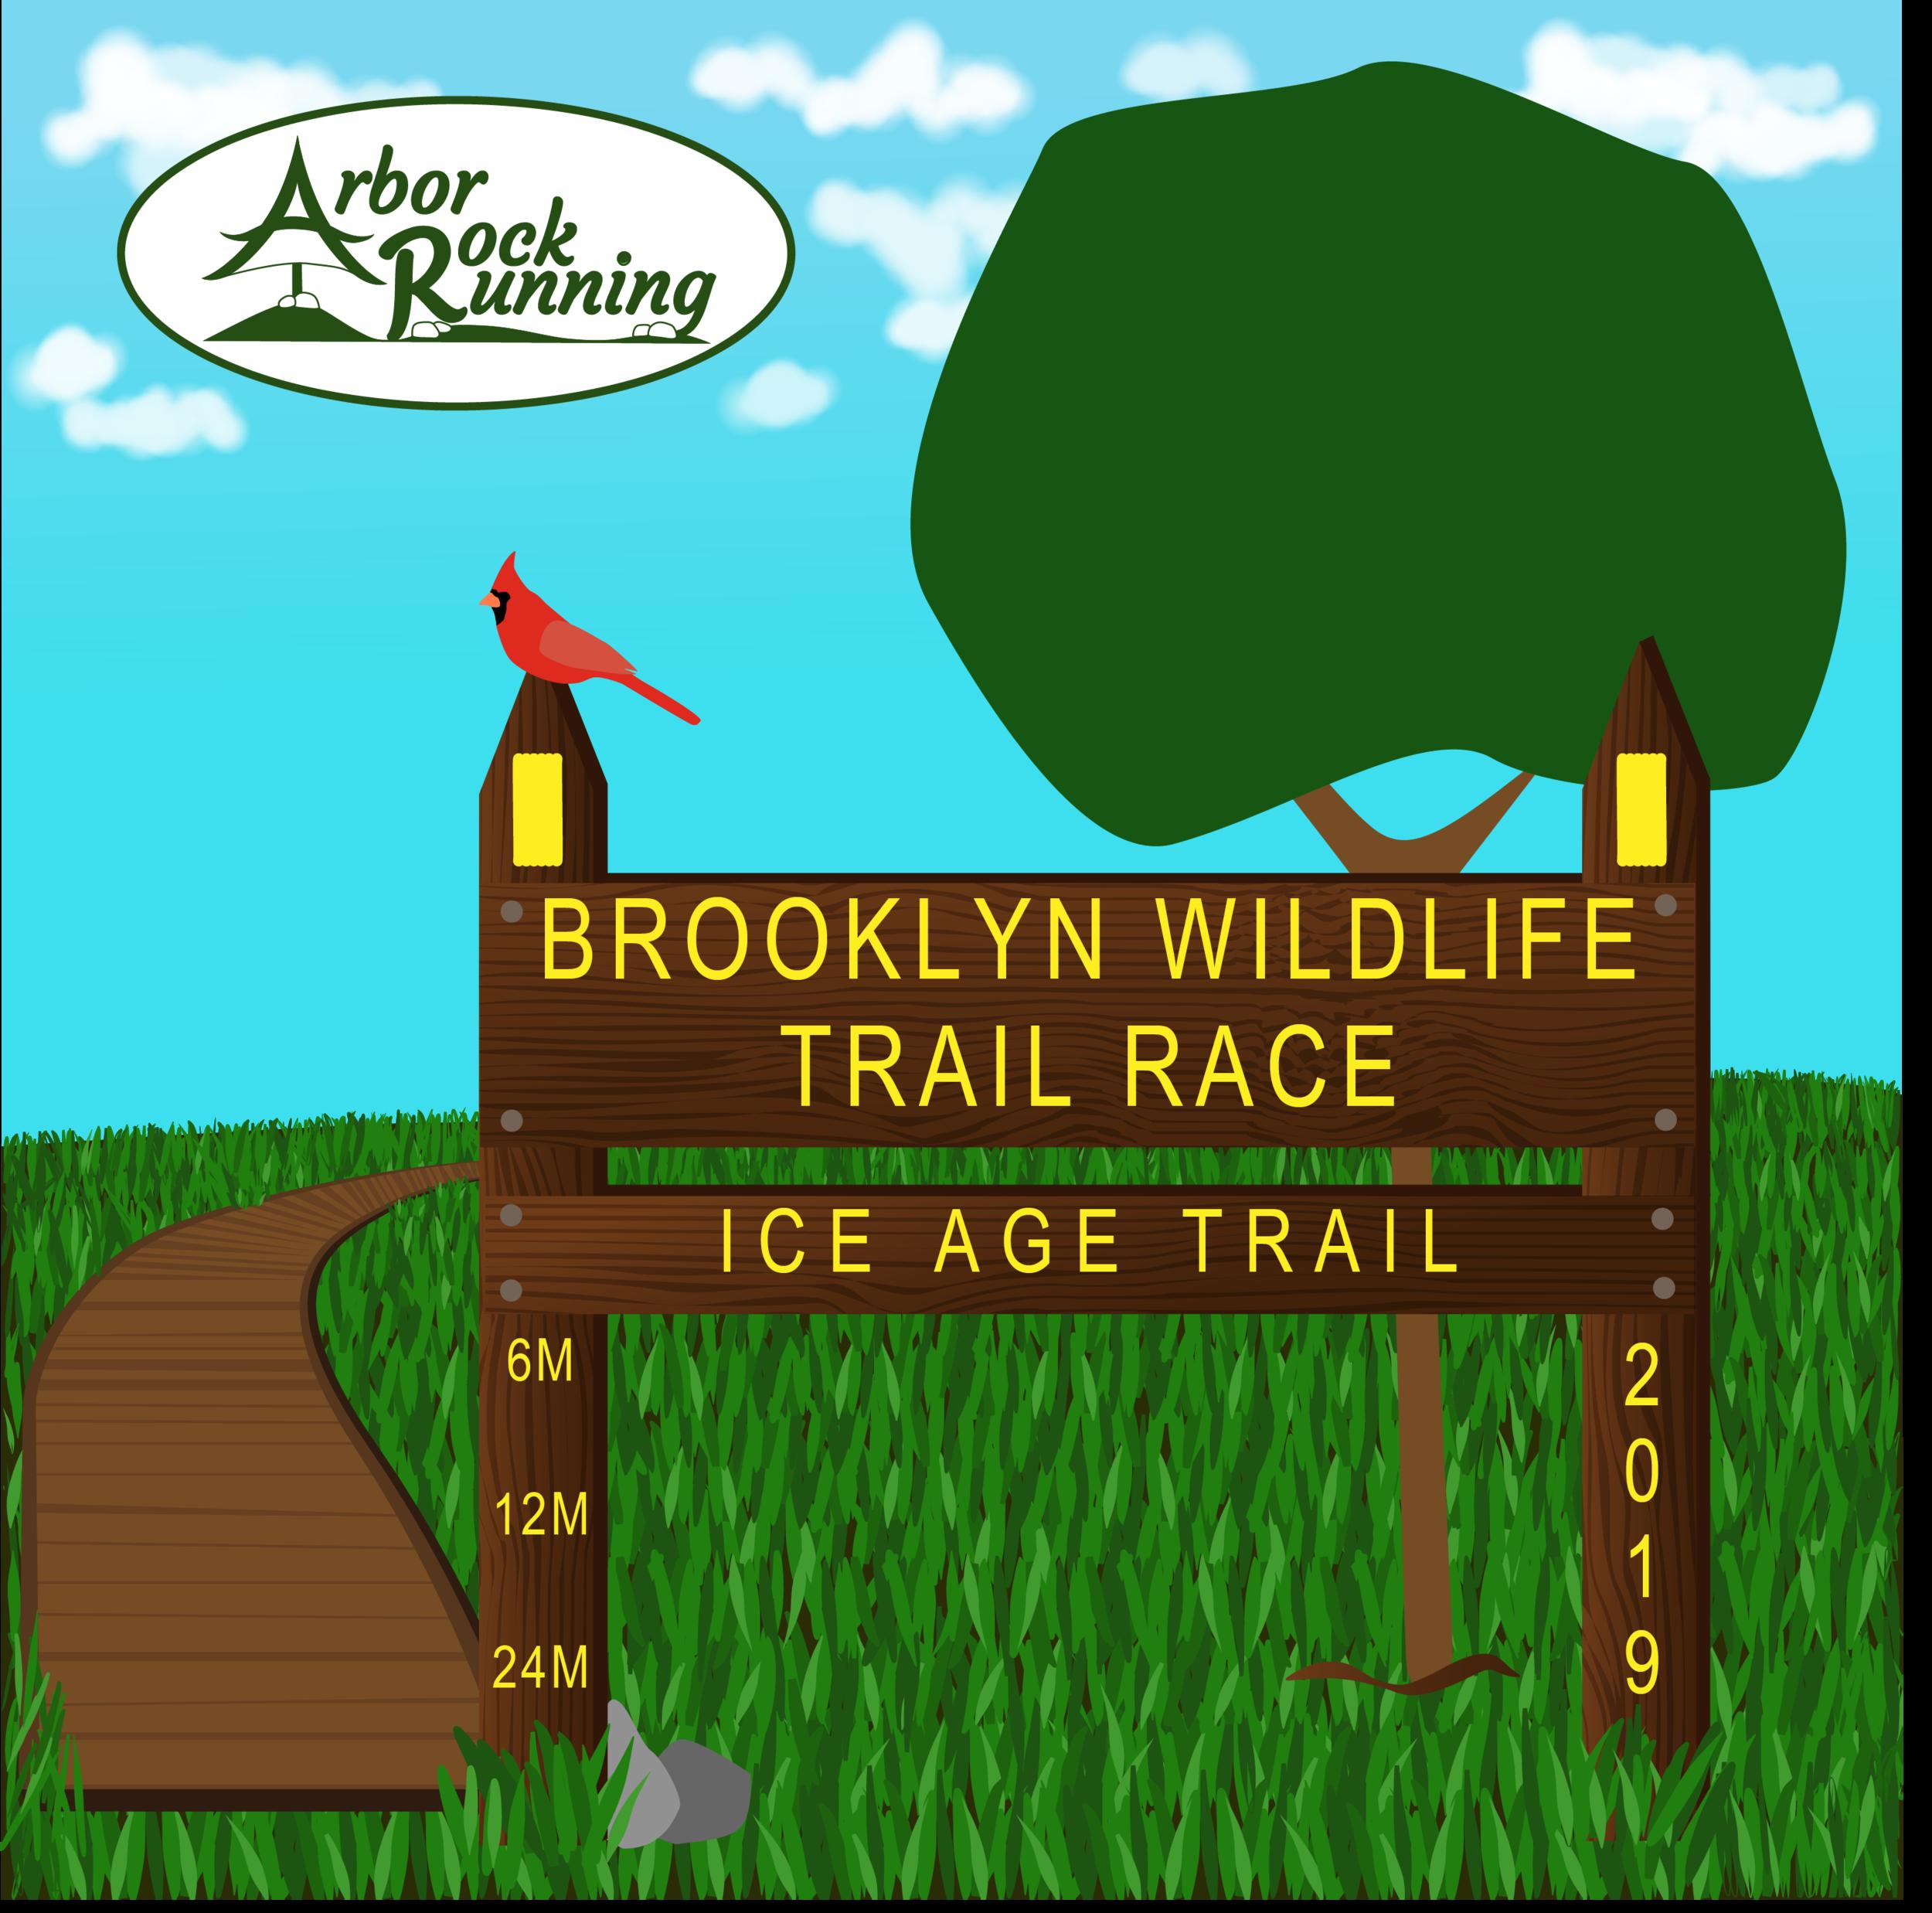 Brooklyn Wildlife Trail Race 2019 Results & Photos - August 24, 2019Click Here for Race ResultsTrail PhotosBoardwalk PhotosStart/Finish Photos